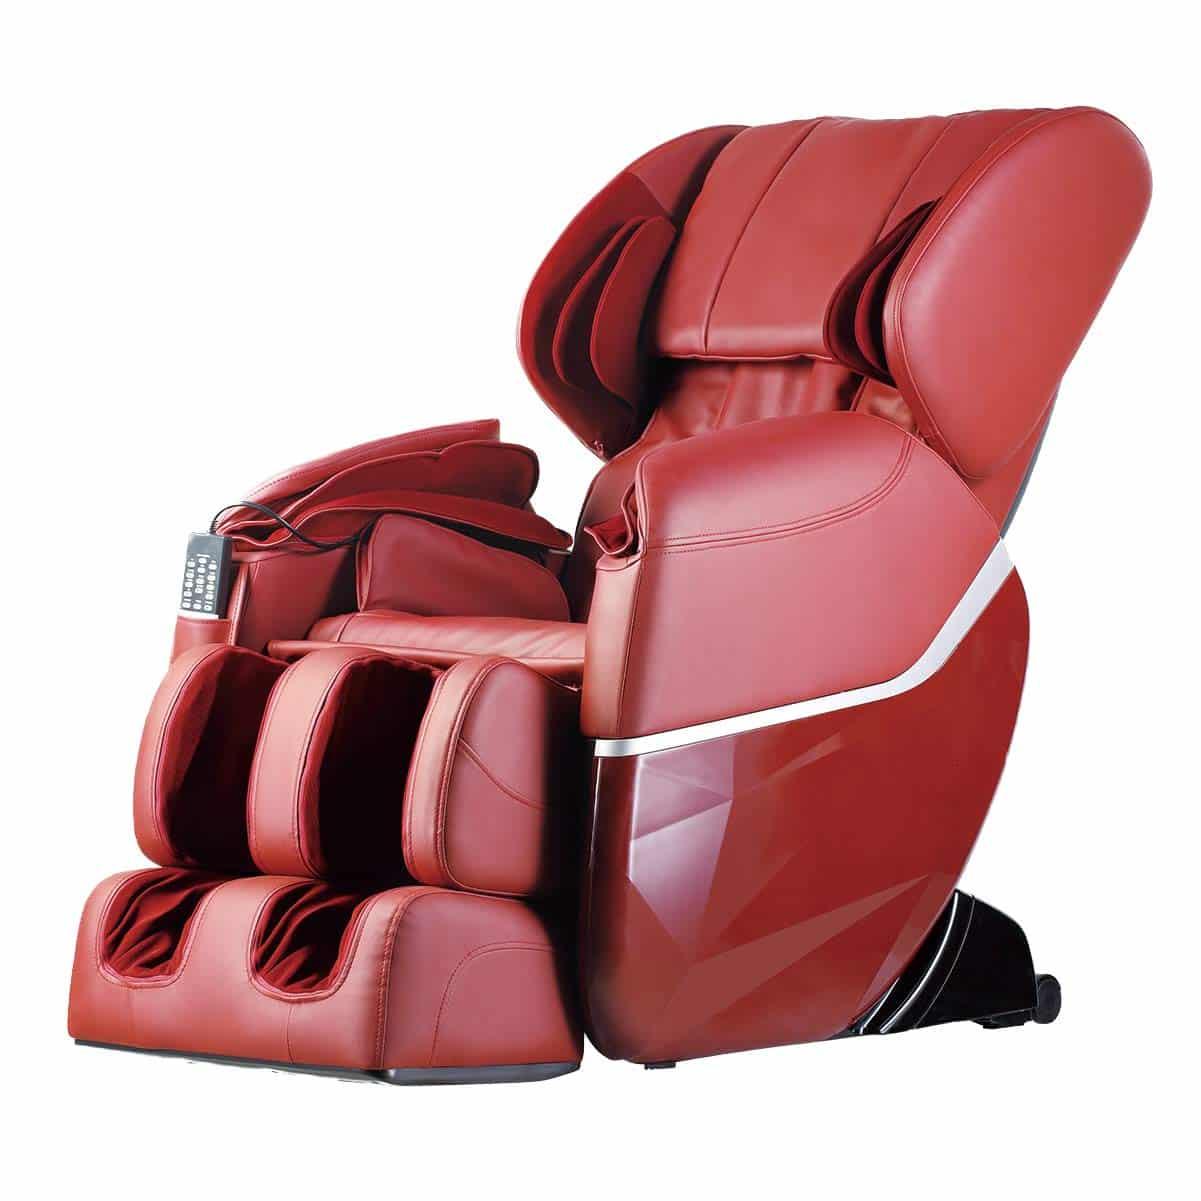 BestMassage Full Body Massage Chair